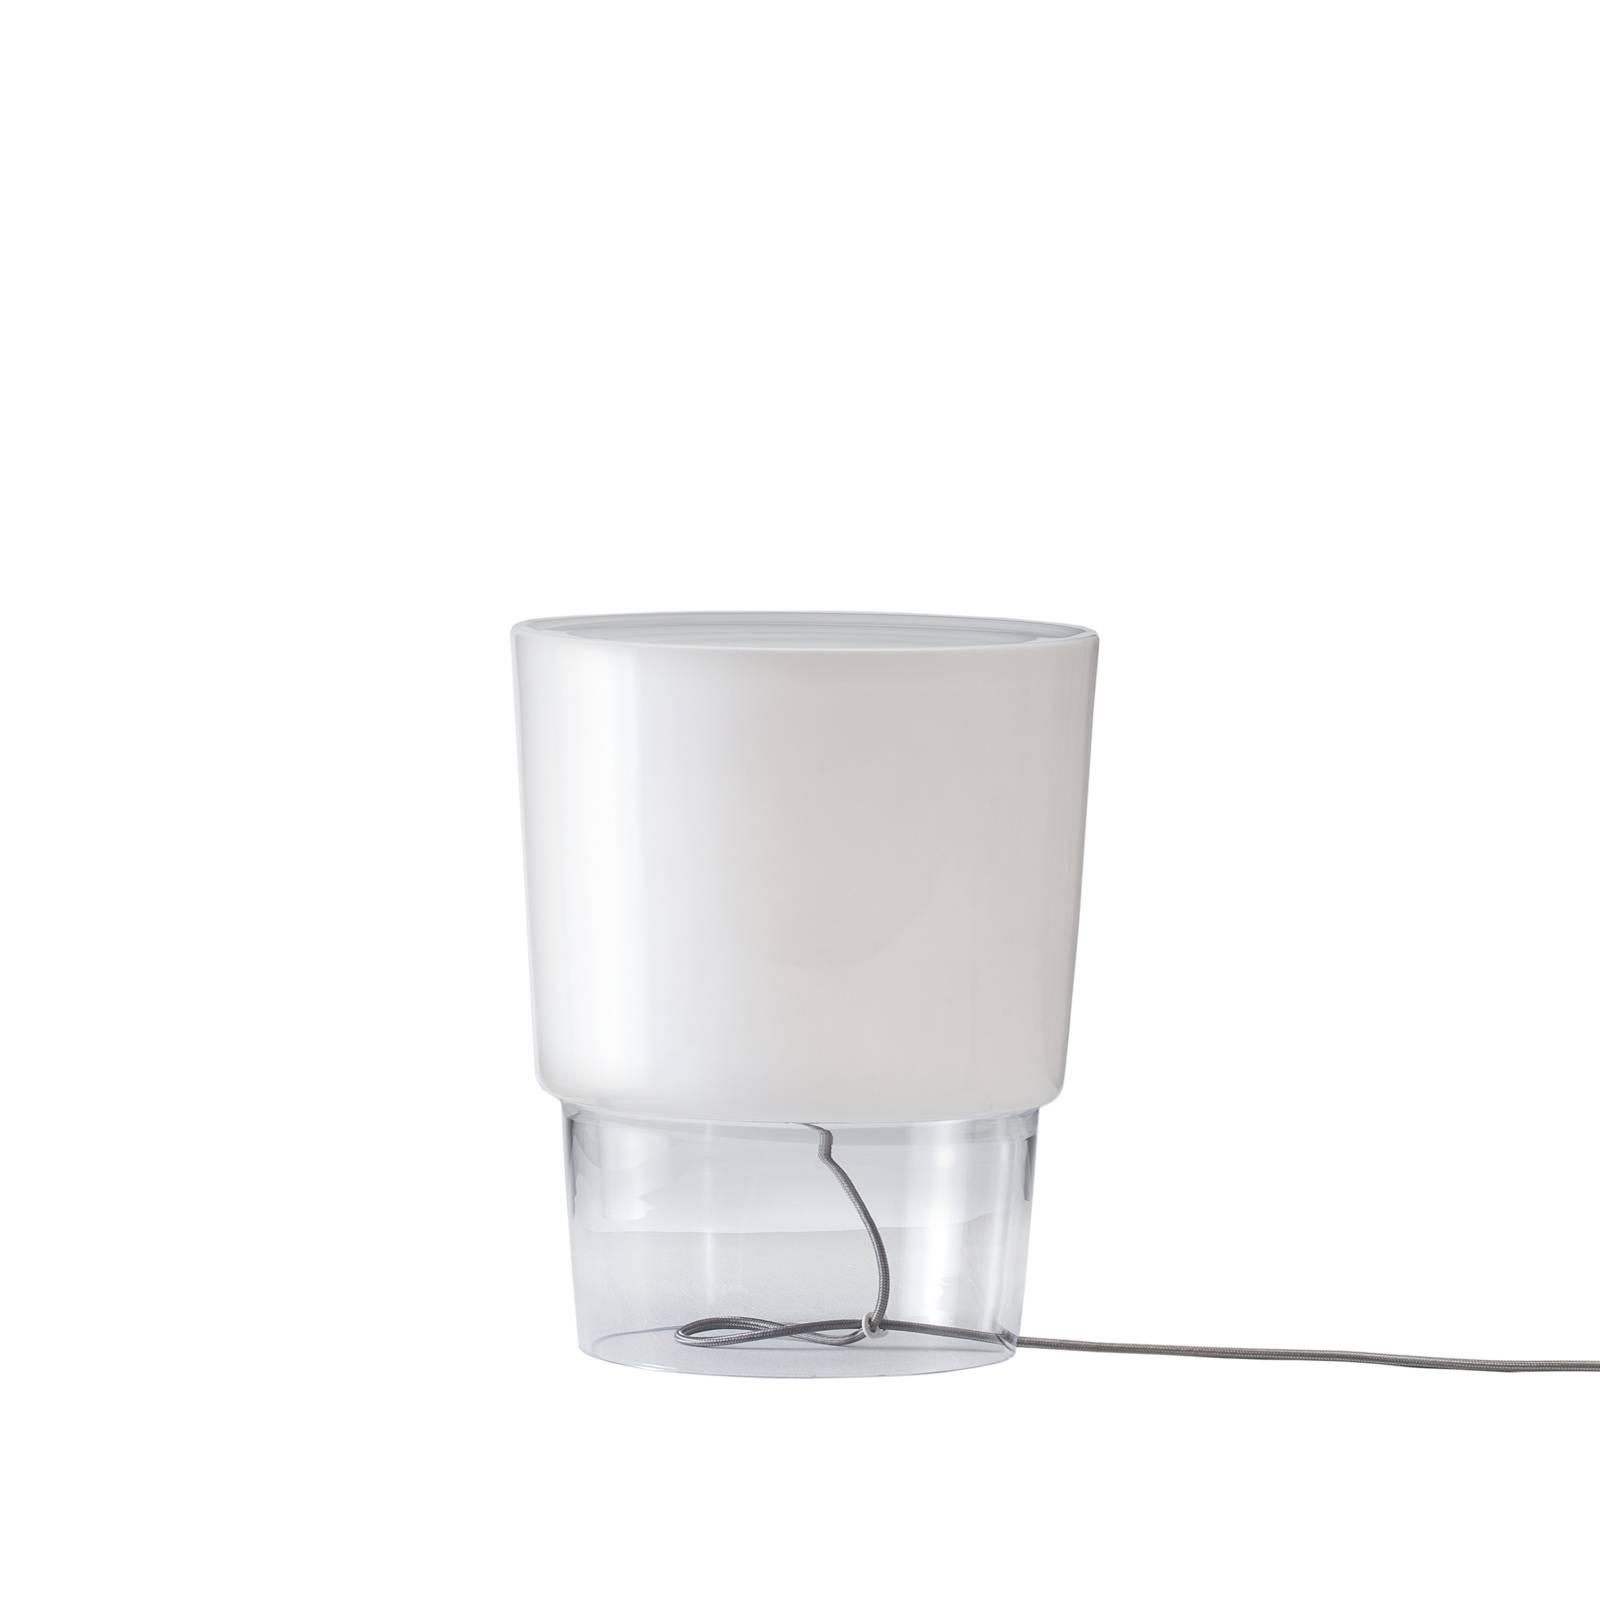 Prandina Vestale T3 lampe à poser blanche/claire